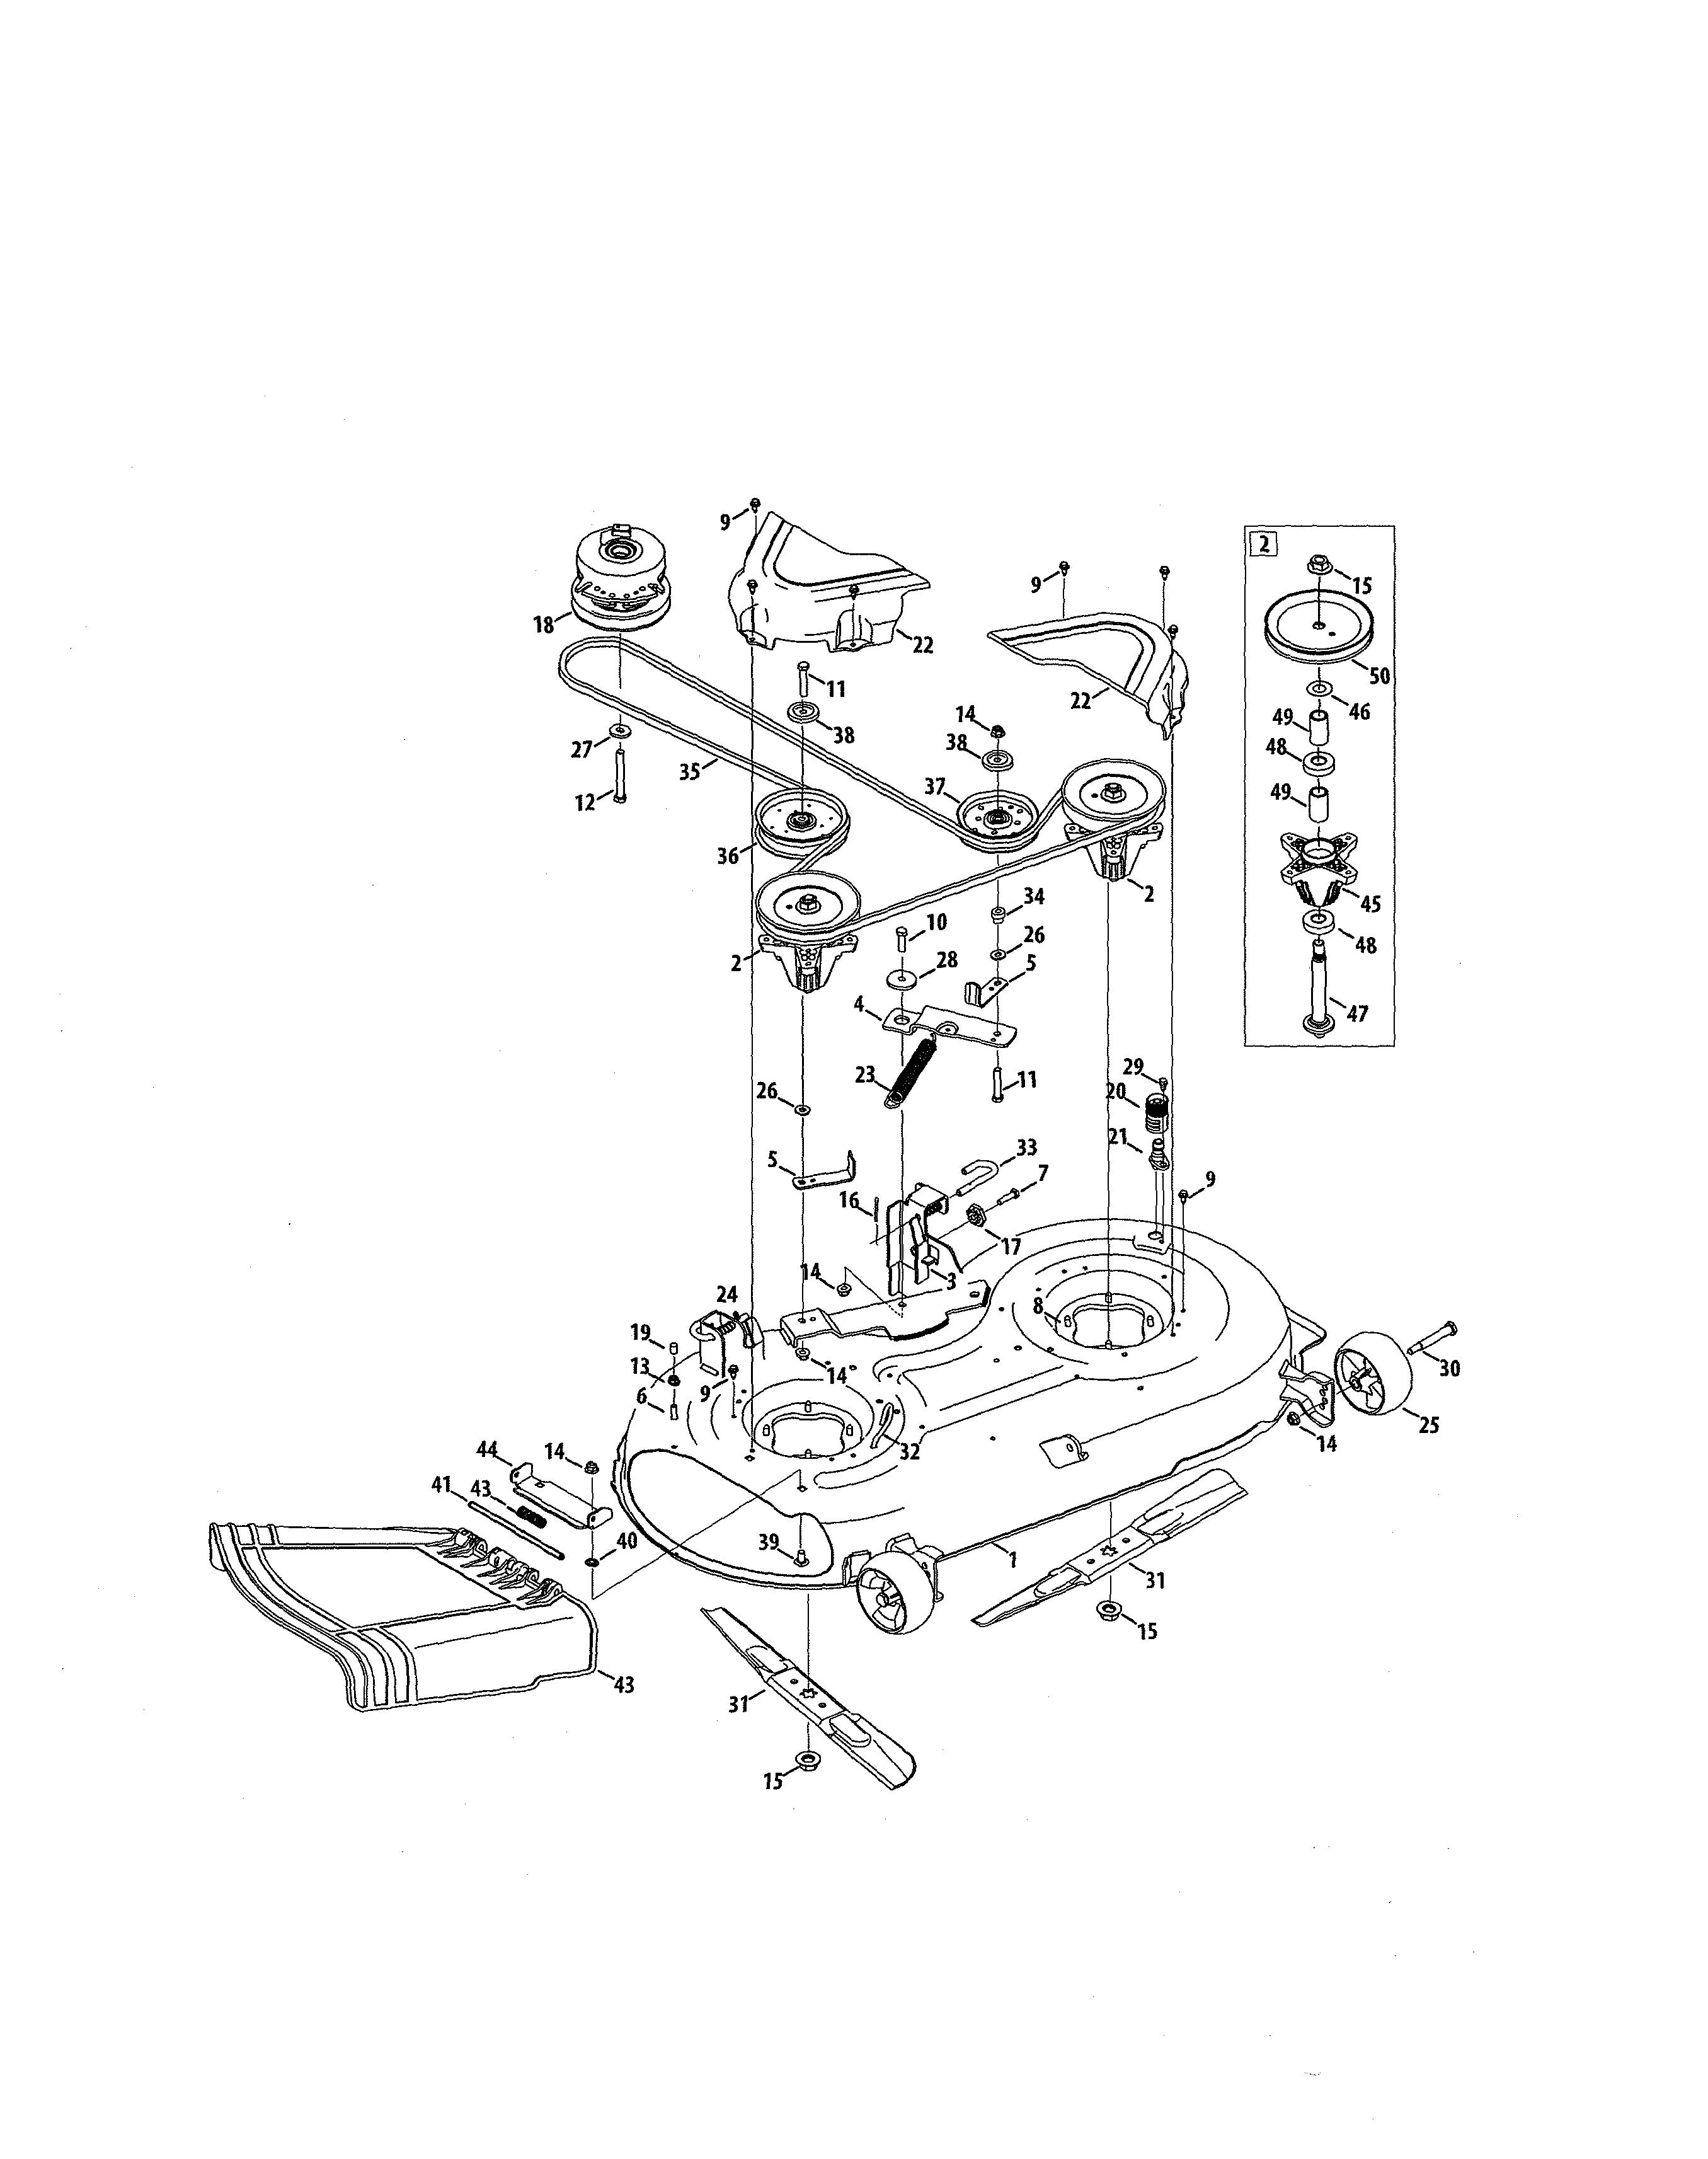 Craftsman  Zero Turn Riding Mower  Deck/spindle